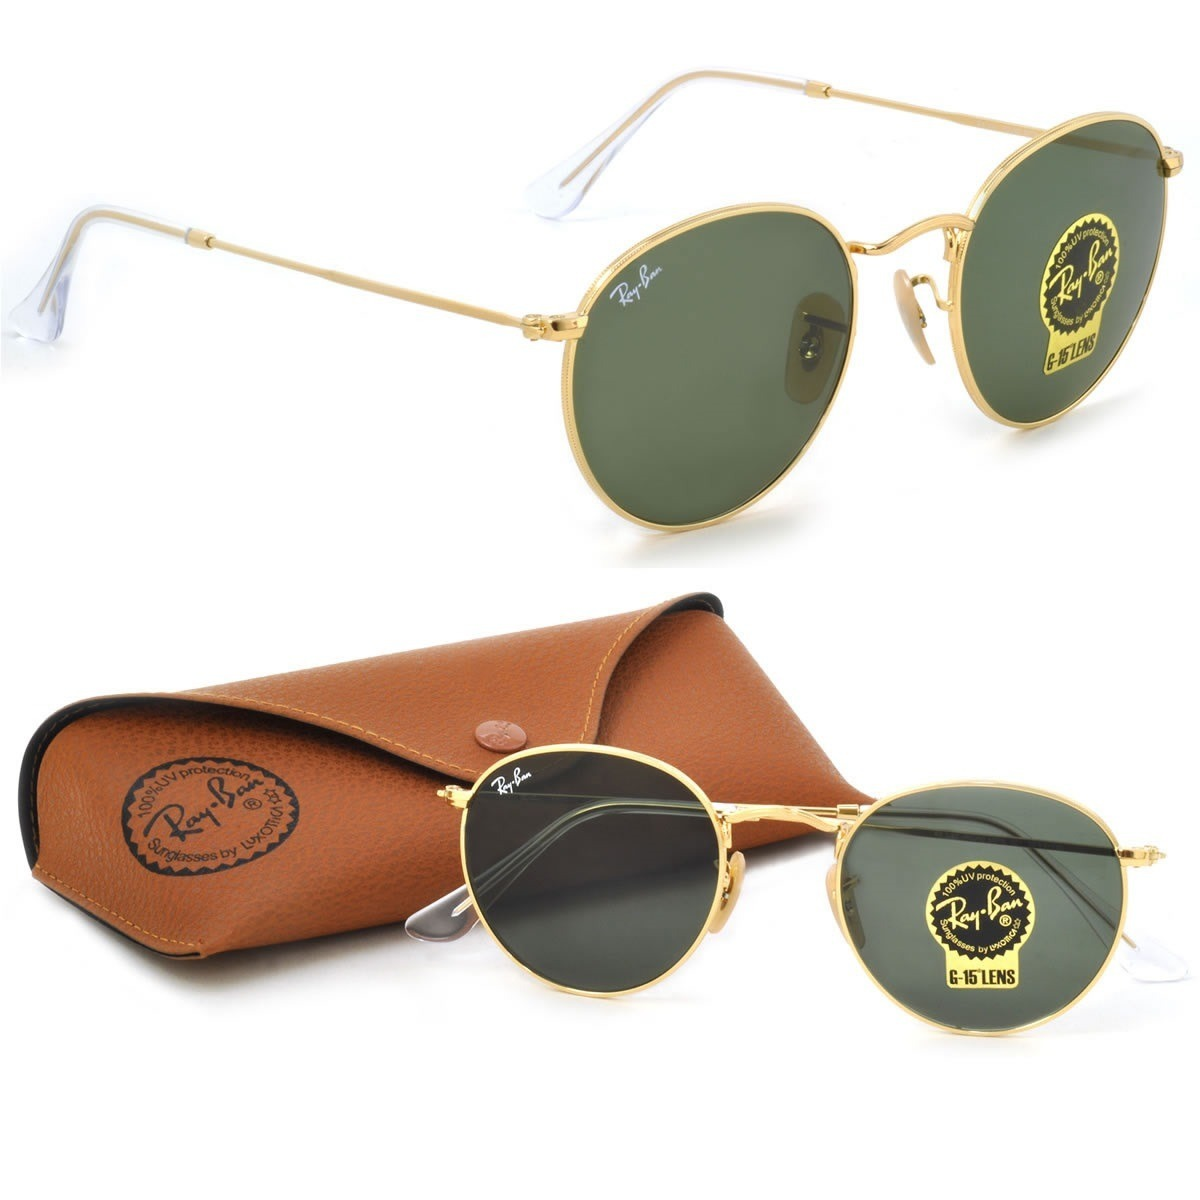 76bd4022a Óculos Ray-ban Round Metal Dourado Verde Original Unissex - R$ 89,90 ...